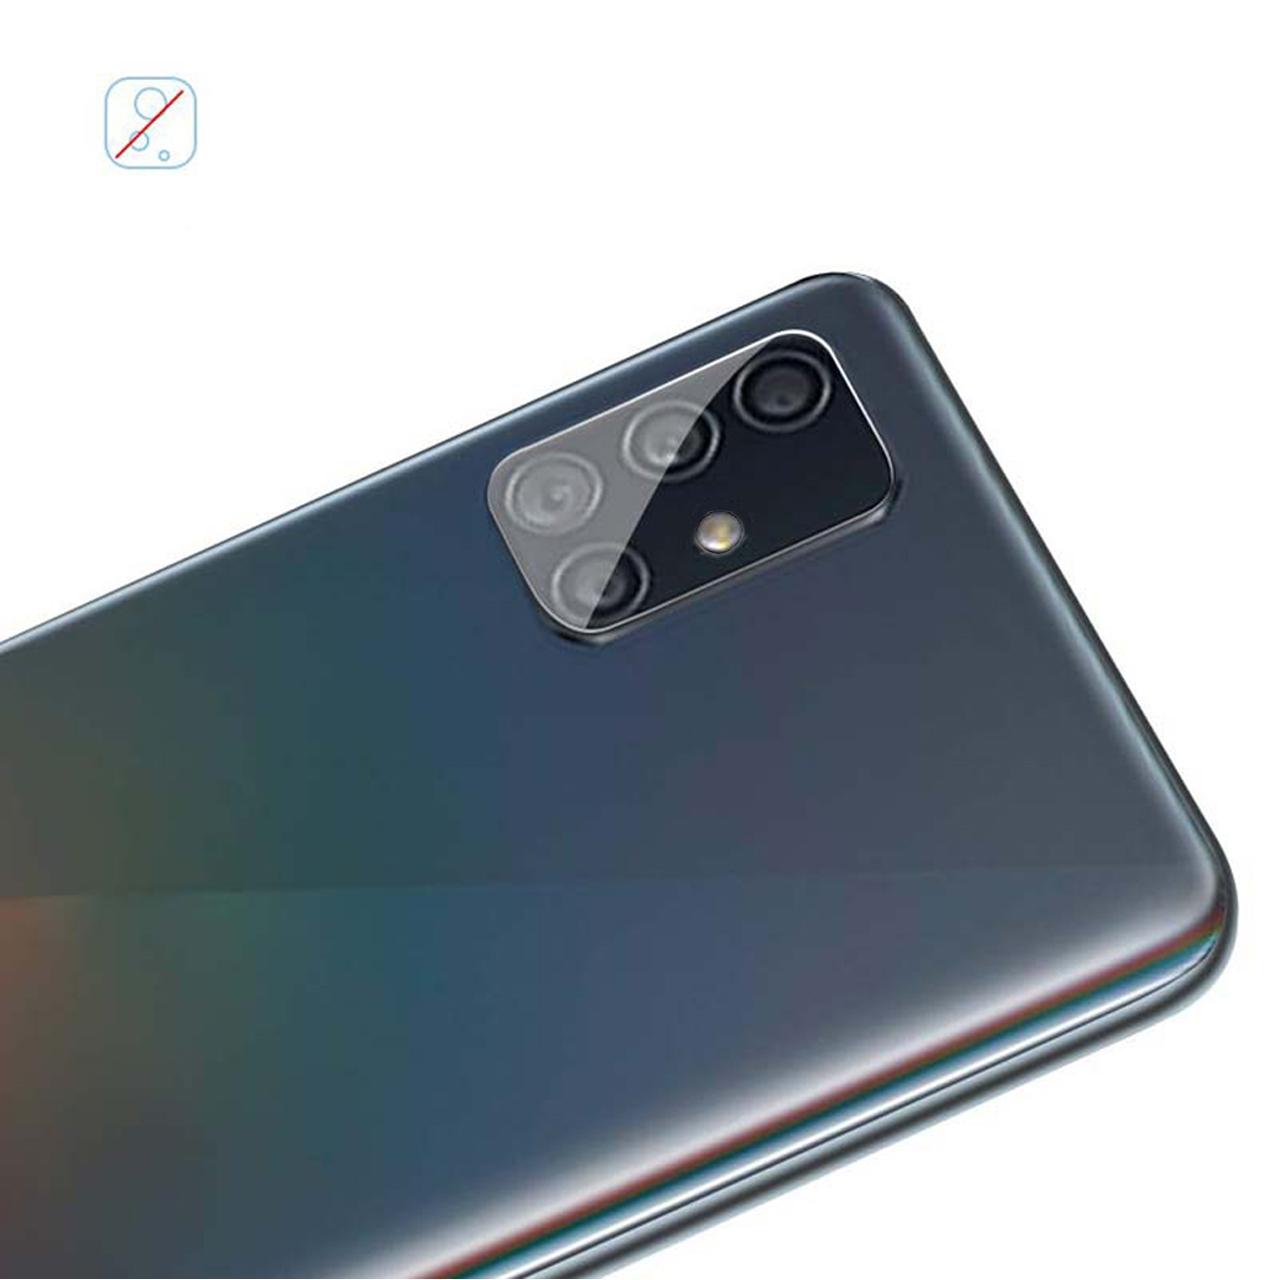 محافظ لنز دوربین سیحان مدل GLP مناسب برای گوشی موبایل سامسونگ Galaxy A71 main 1 6